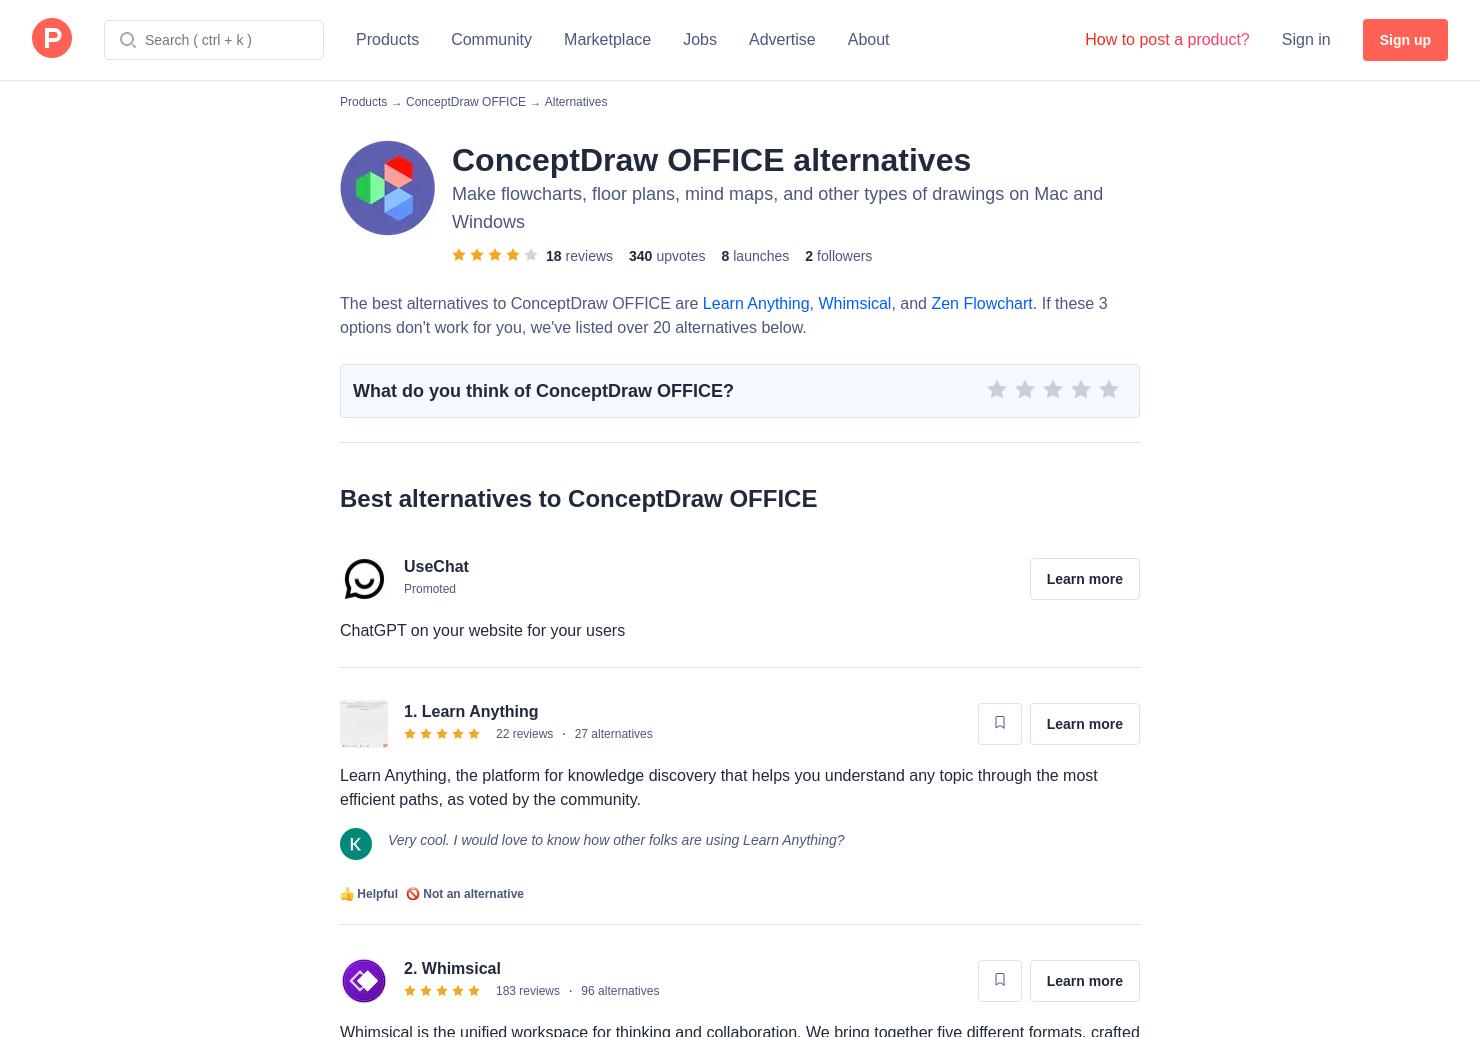 16 Alternatives to ConceptDraw MINDMAP v10 for Windows, Mac